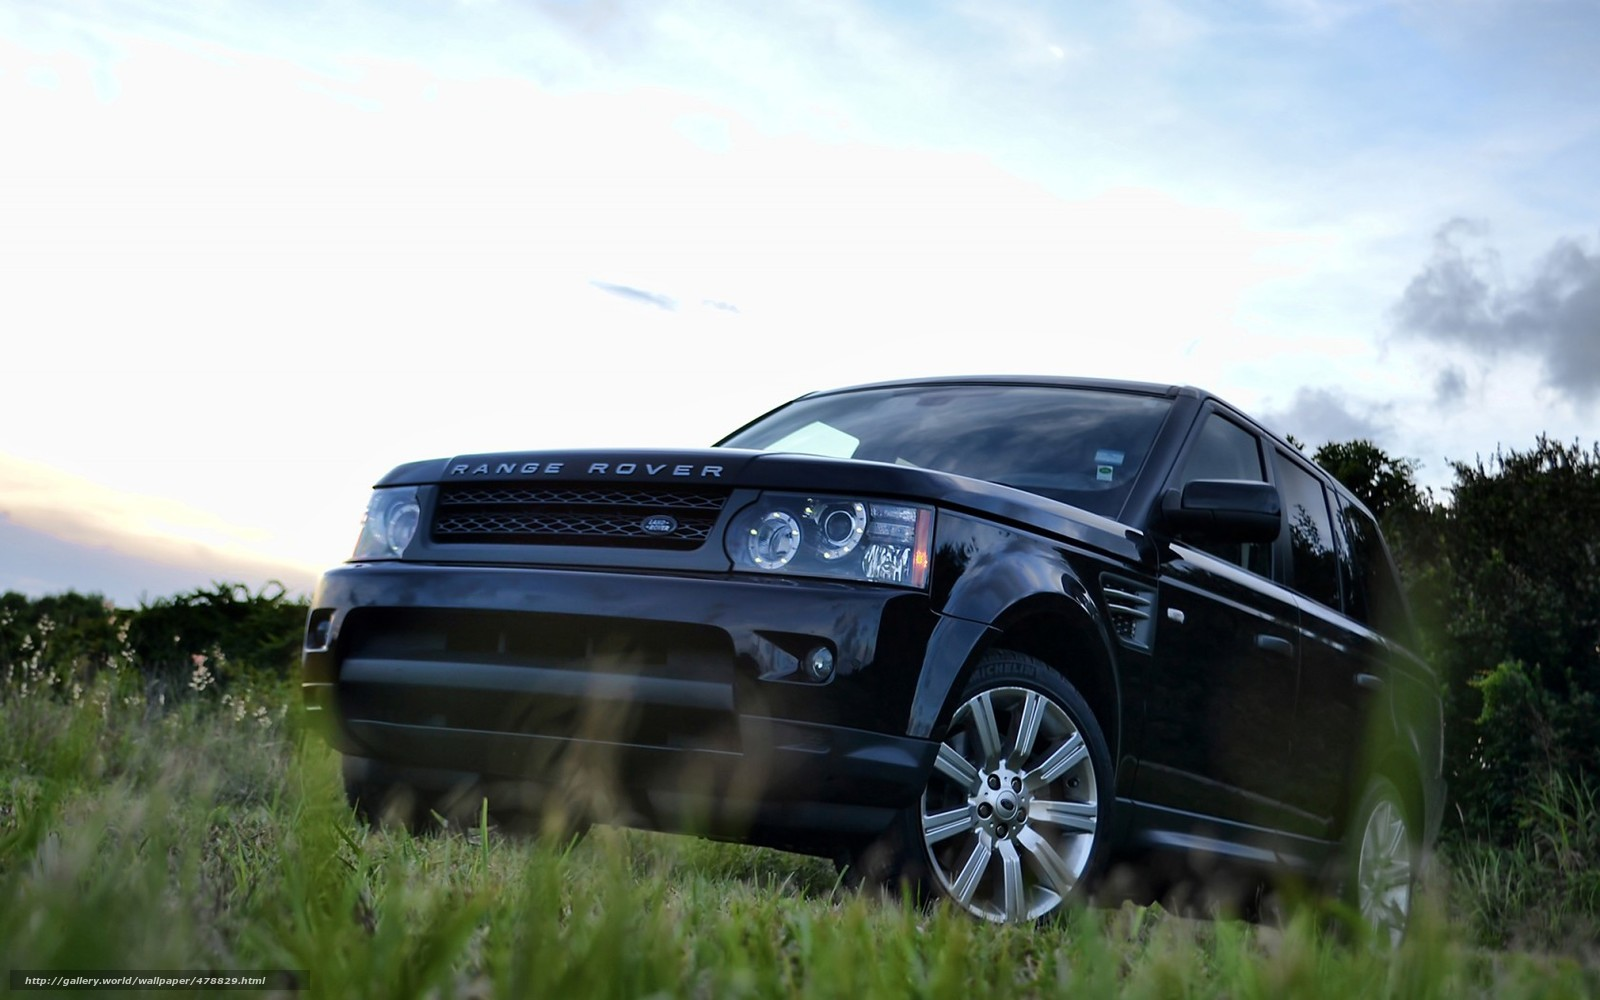 Black Range Rover Sport Wallpaper: Download Wallpaper Range Rover, Land Rover, Sport, Black